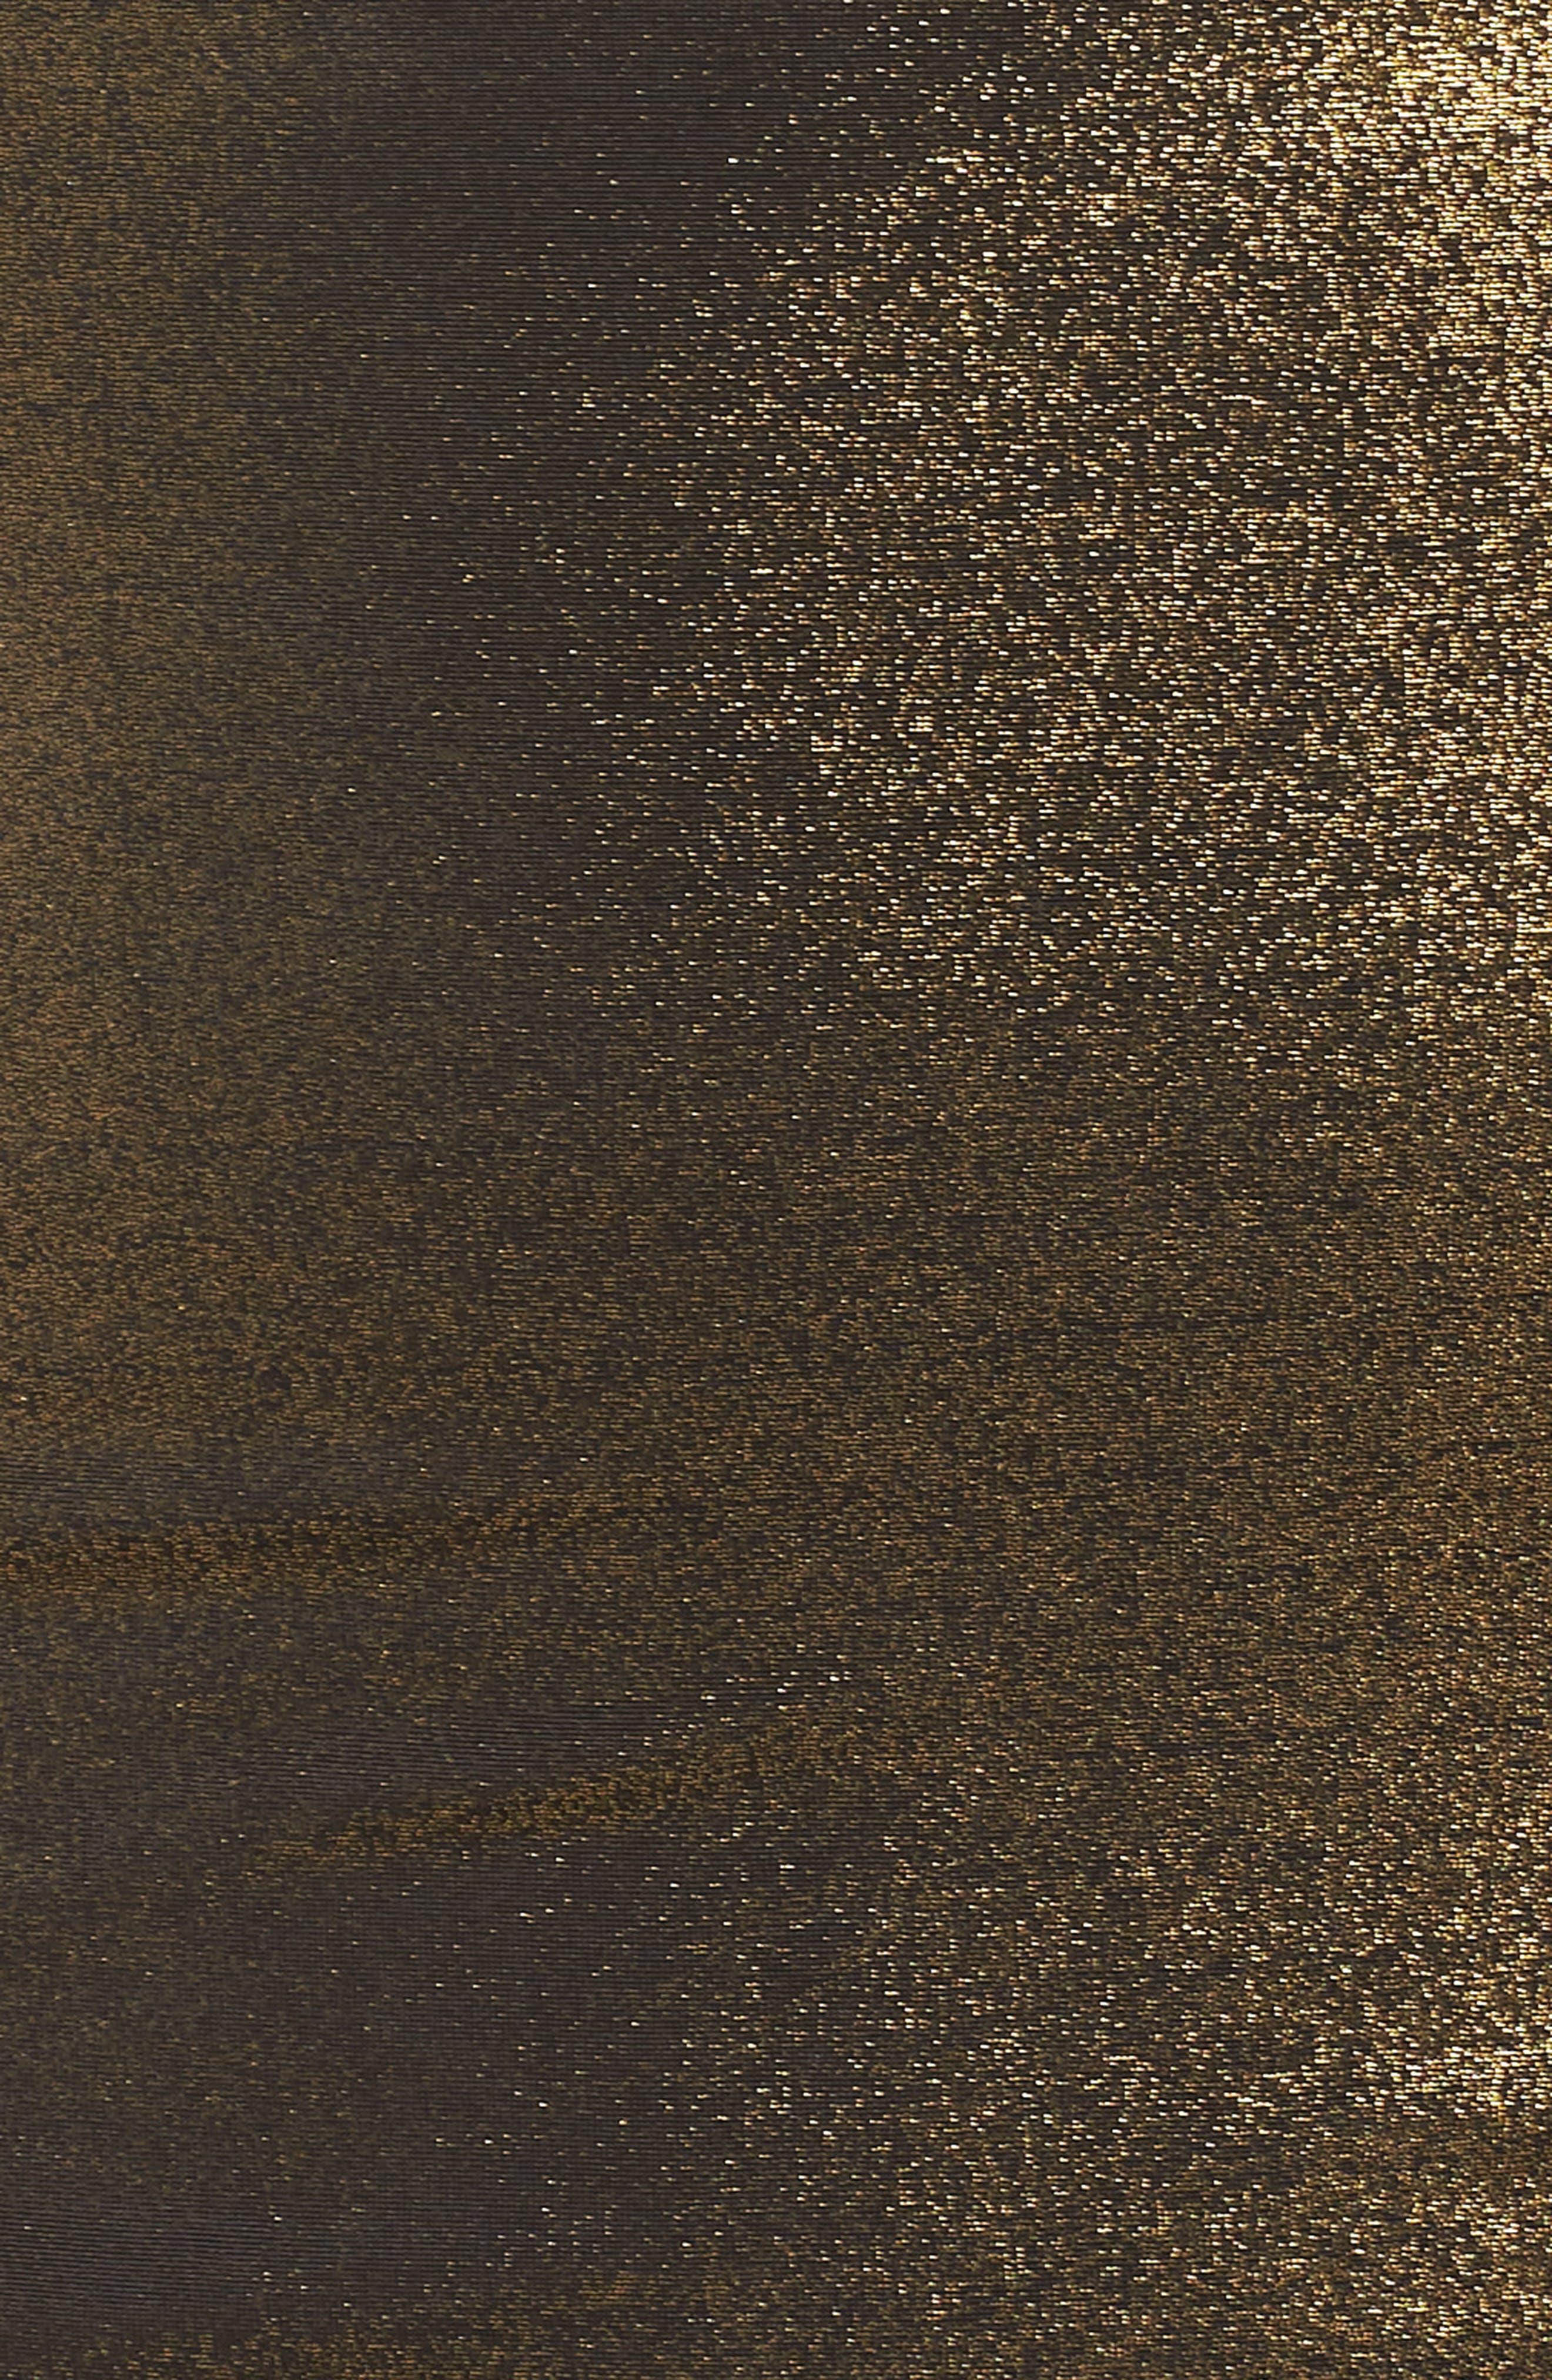 Cowl Neck Minidress,                             Alternate thumbnail 5, color,                             METALLIC GOLD